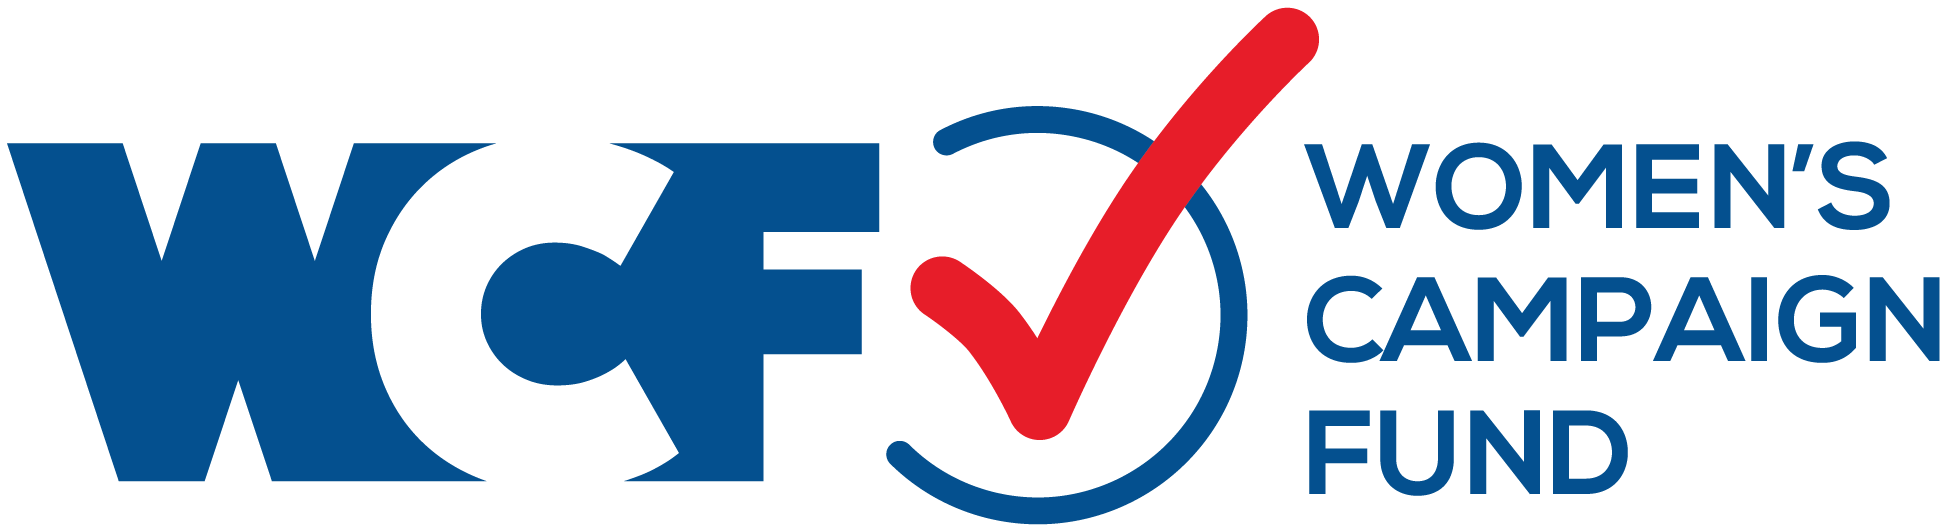 Women's Campaign Fund